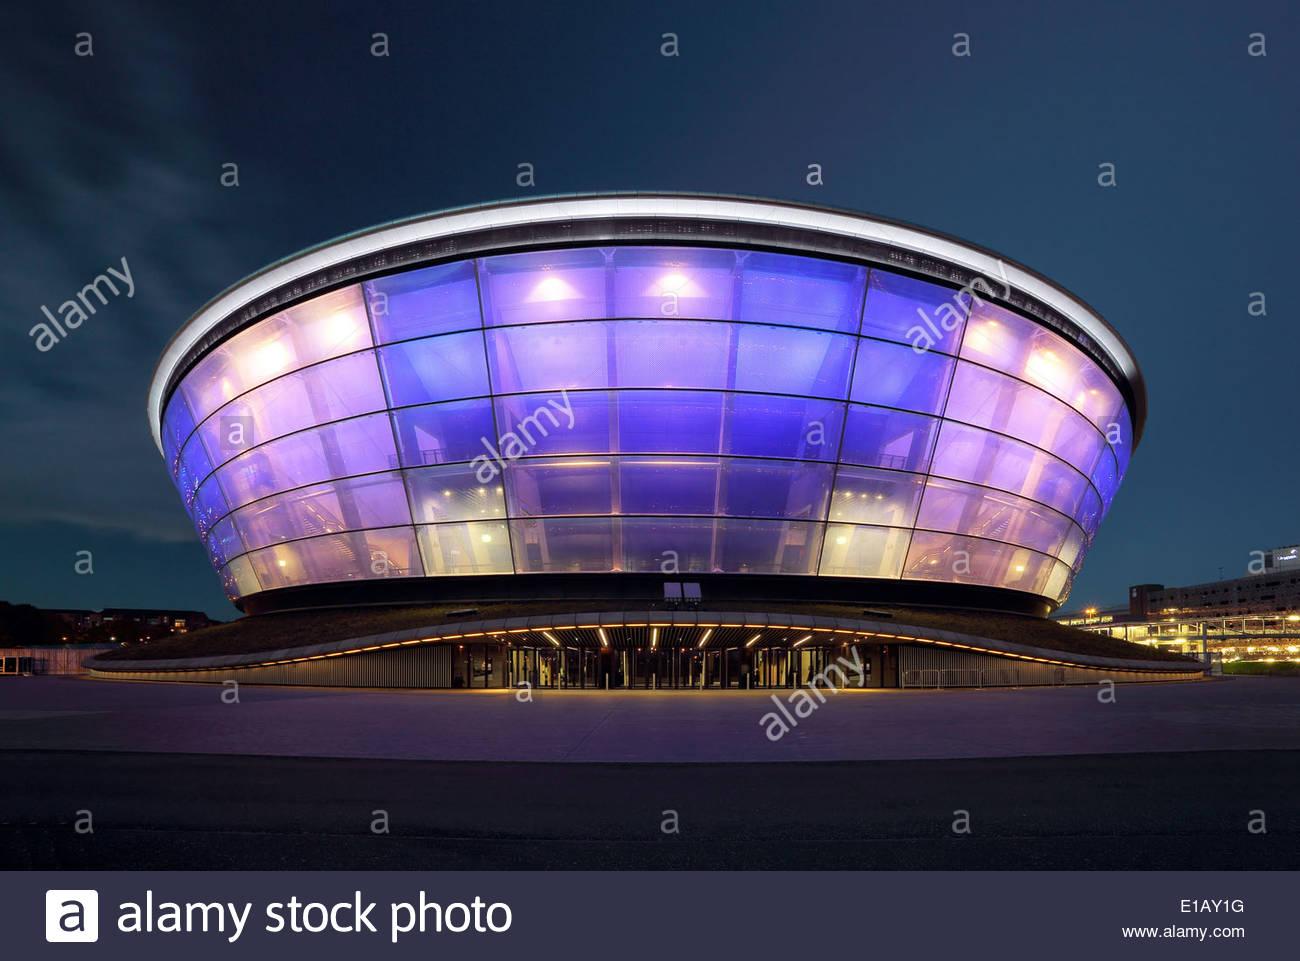 Hydro Arena Glasgow - Stock Image